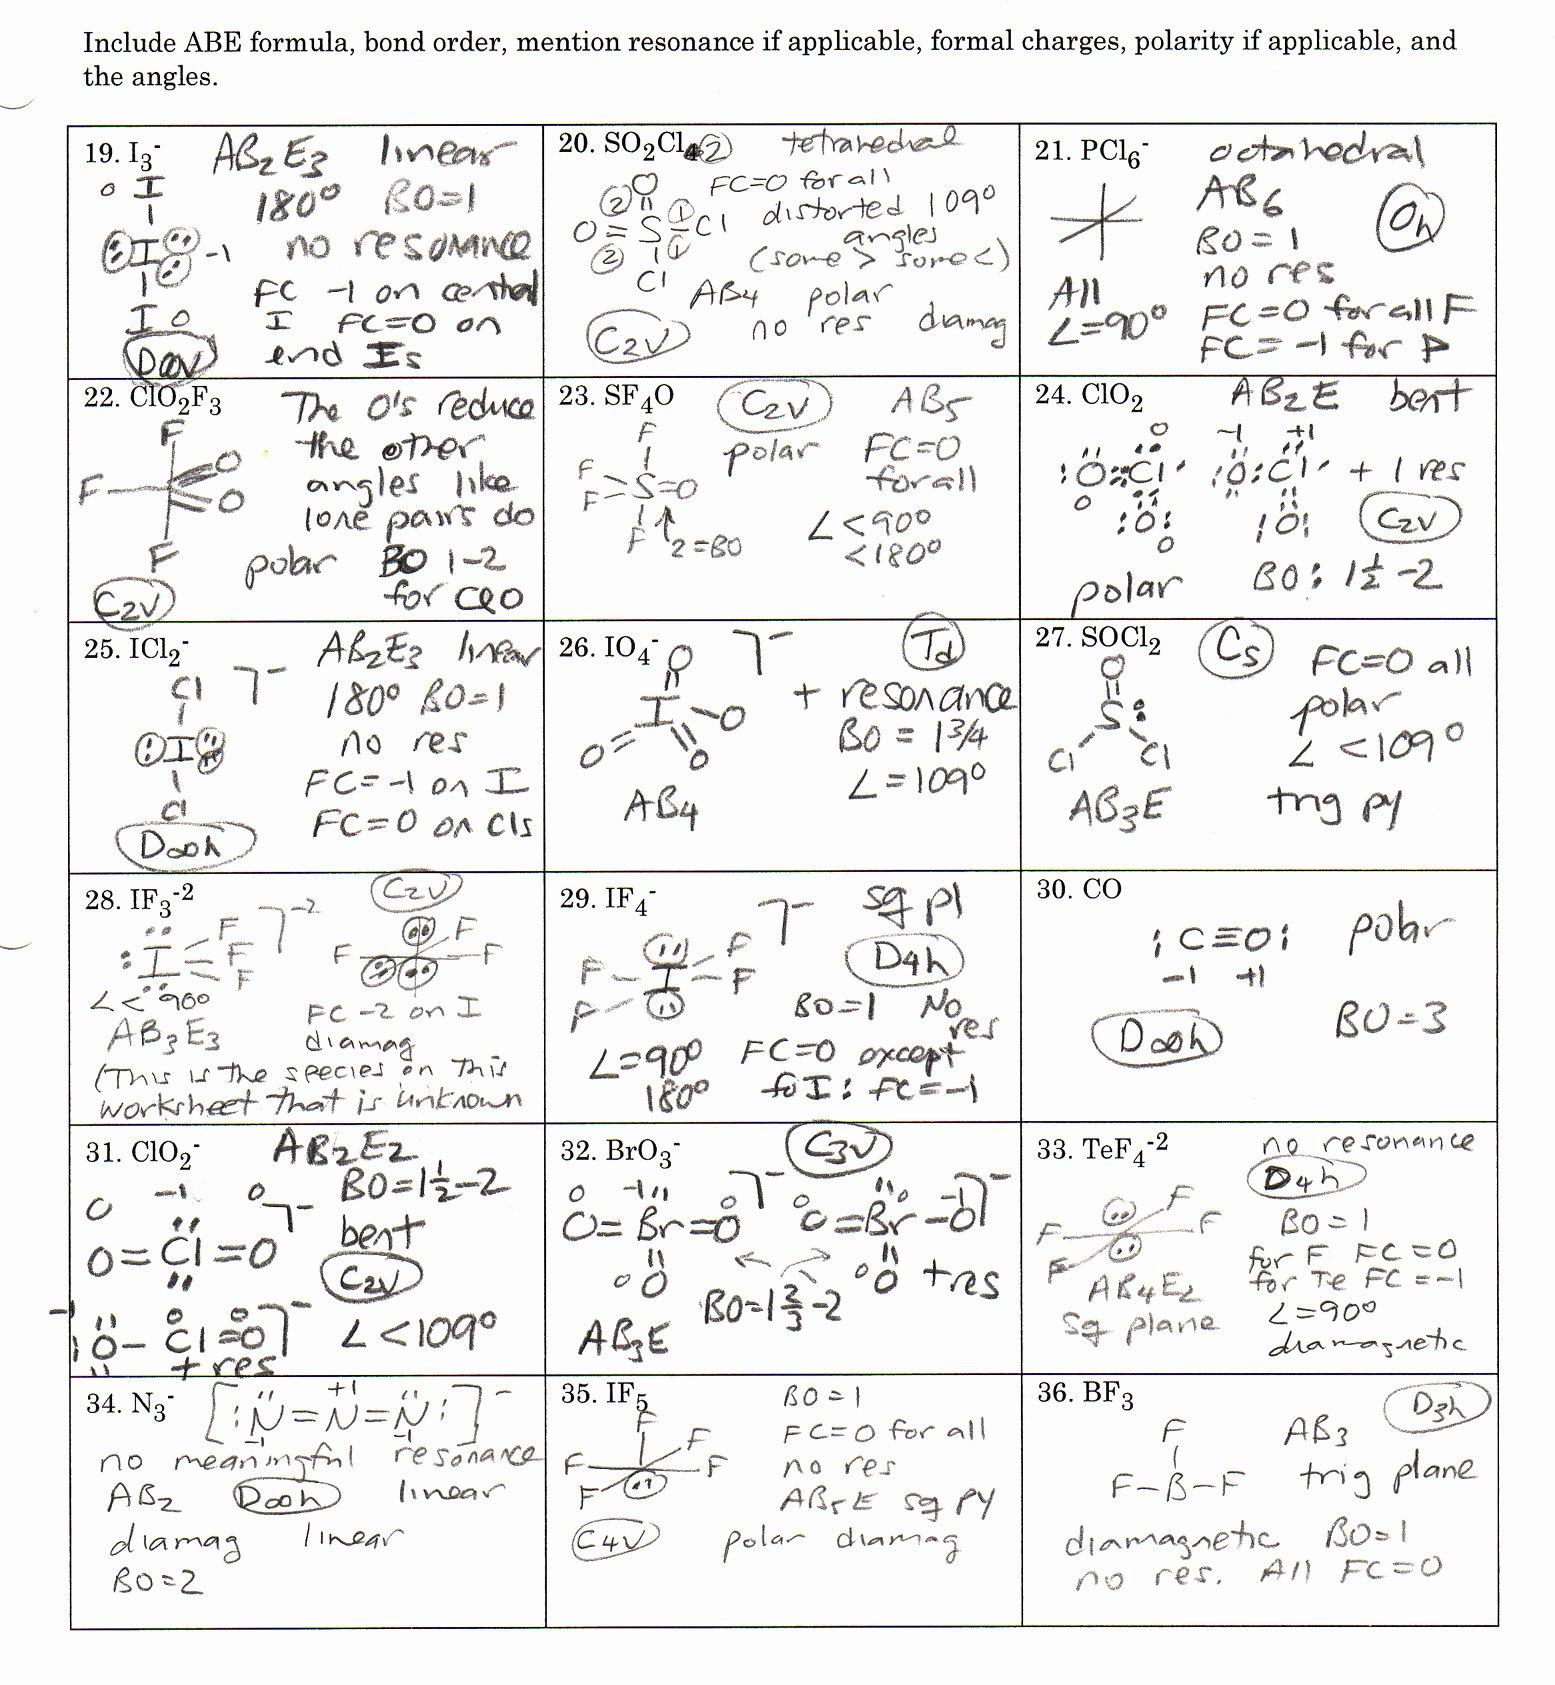 Lewis Dot Structure Practice Worksheet Luxury Lewis Dot Structure Worksheet with Answers Worksheets